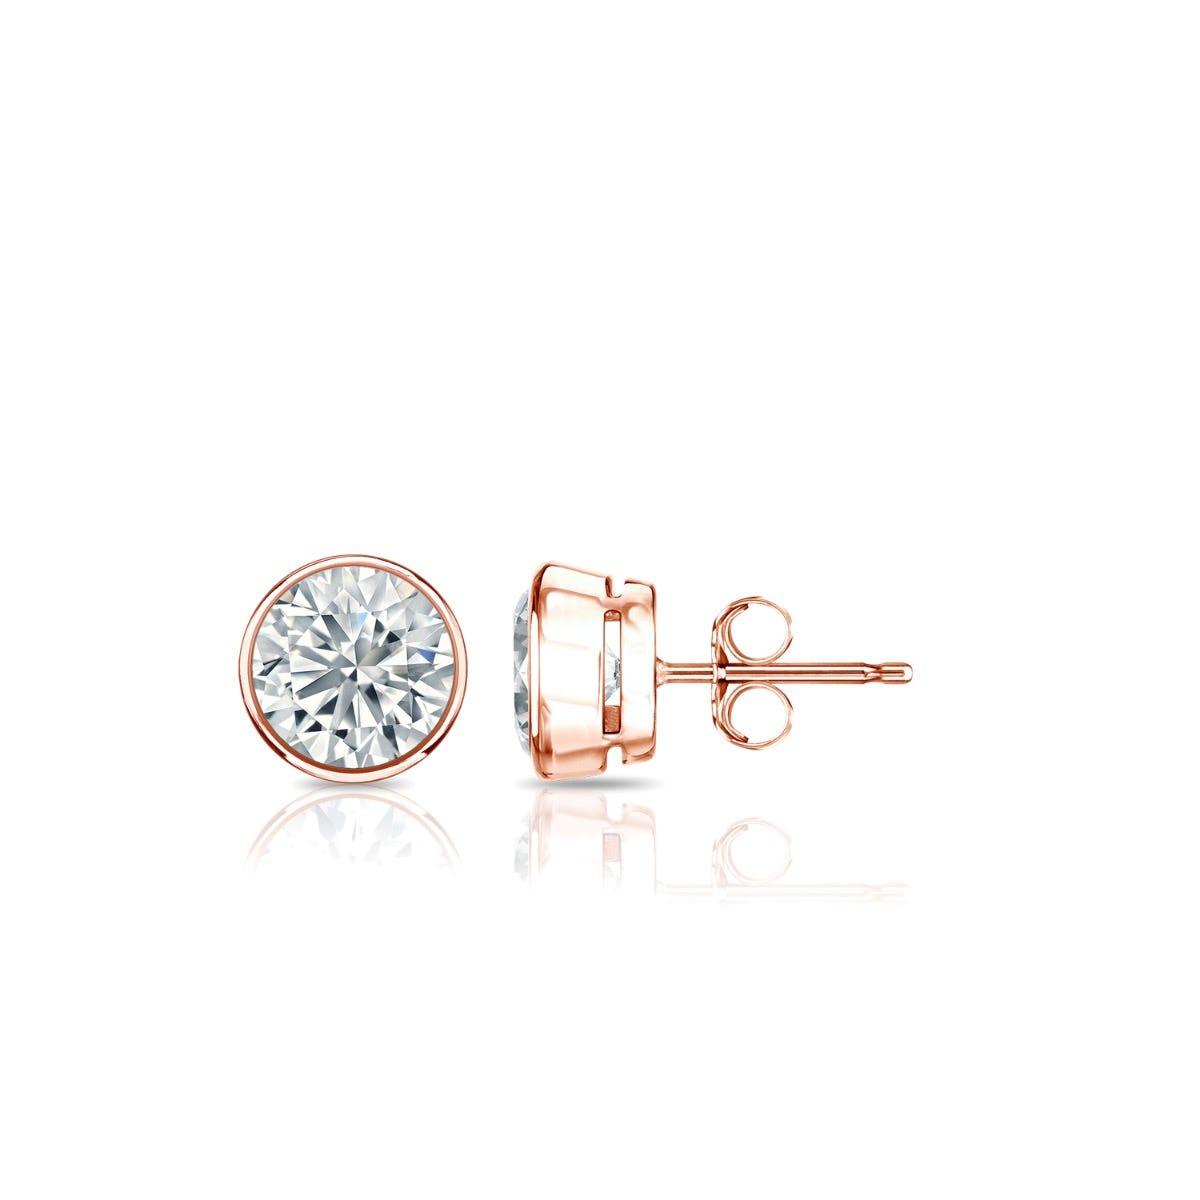 Diamond Round Bezel-Set 1/2ctw. Solitaire Stud (IJ-SI2) Earrings in 14K Rose Gold